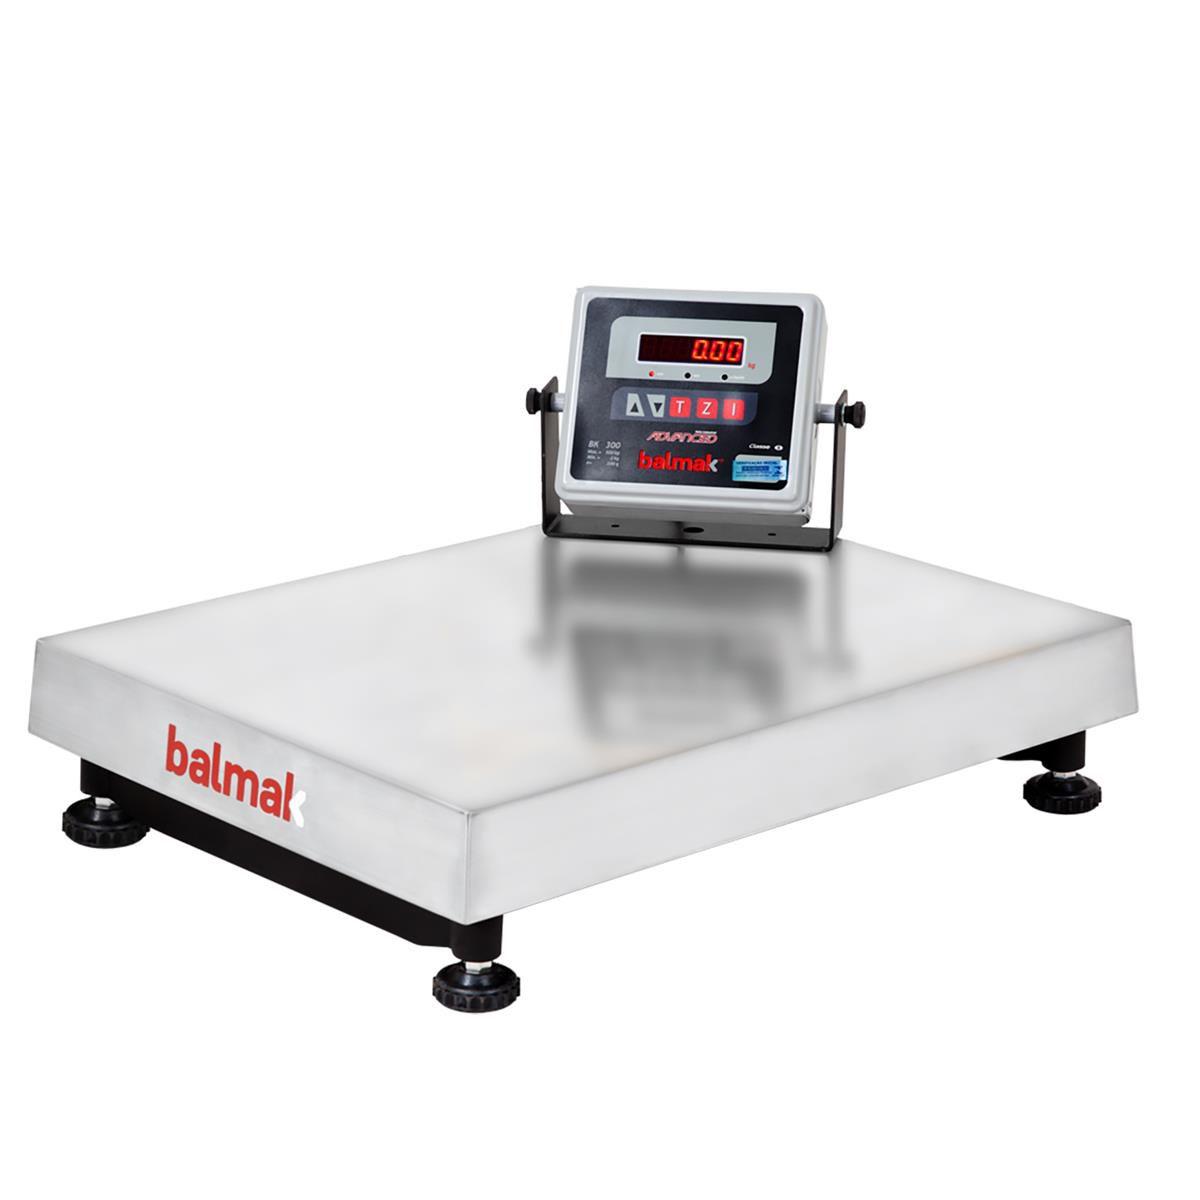 Balança Digital Balmak Plataforma 300Kg Inox com Bateria BK-300I1B